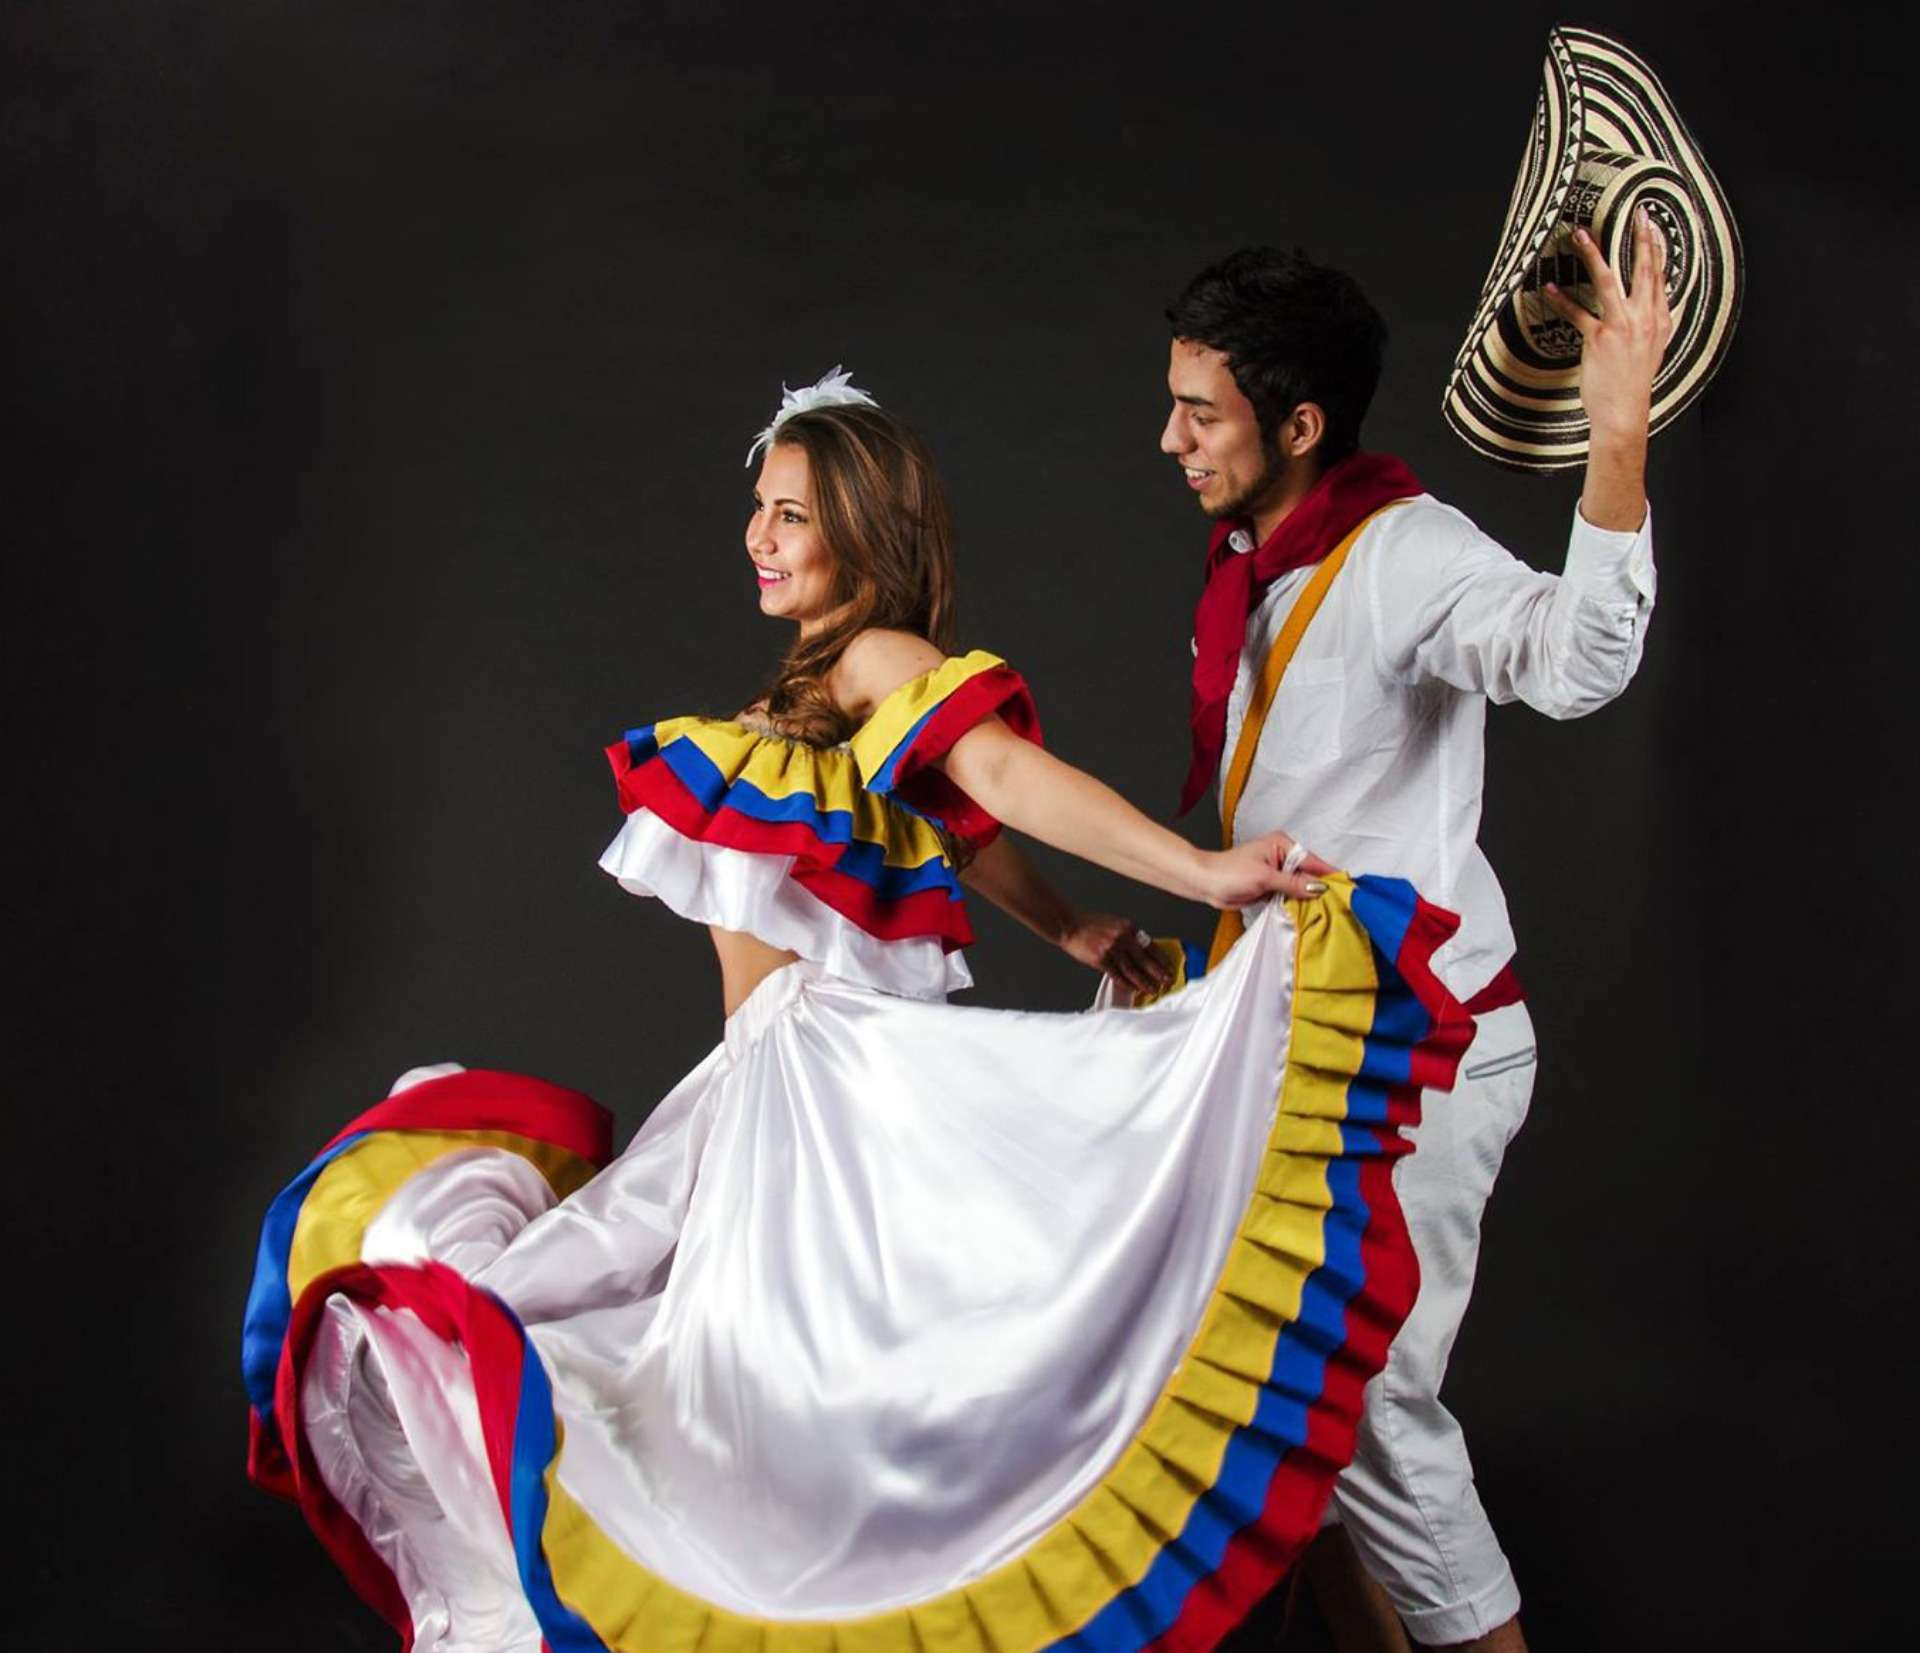 Vestido cumbia colombiana